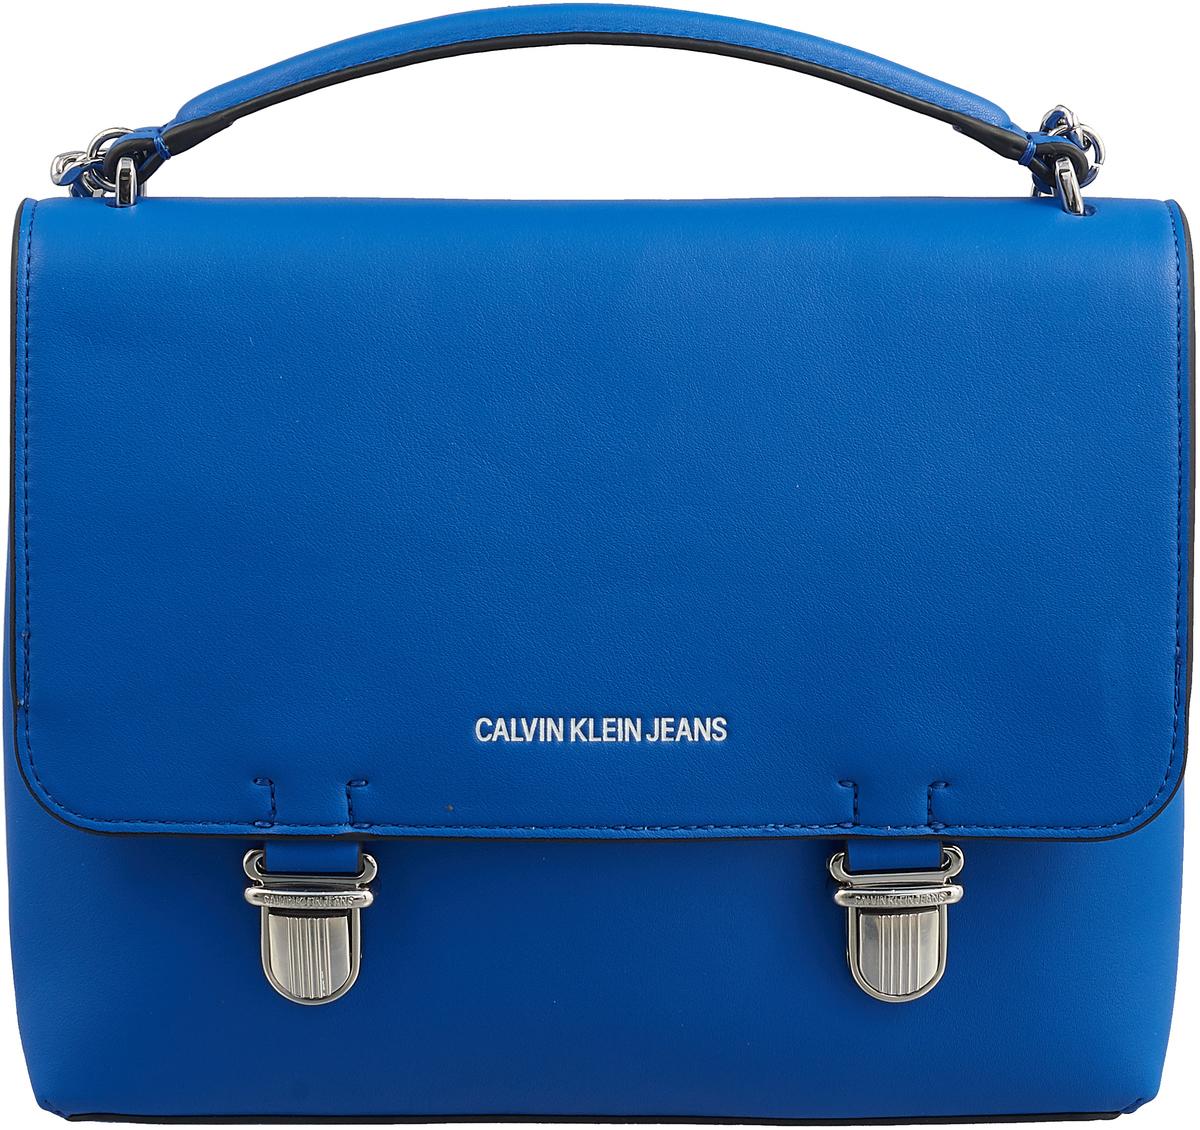 Сумка женская Calvin Klein Jeans, цвет: синий. K40K400614/4550 рубашка женская calvin klein jeans цвет синий j20j209111 9110 размер xs 40 42